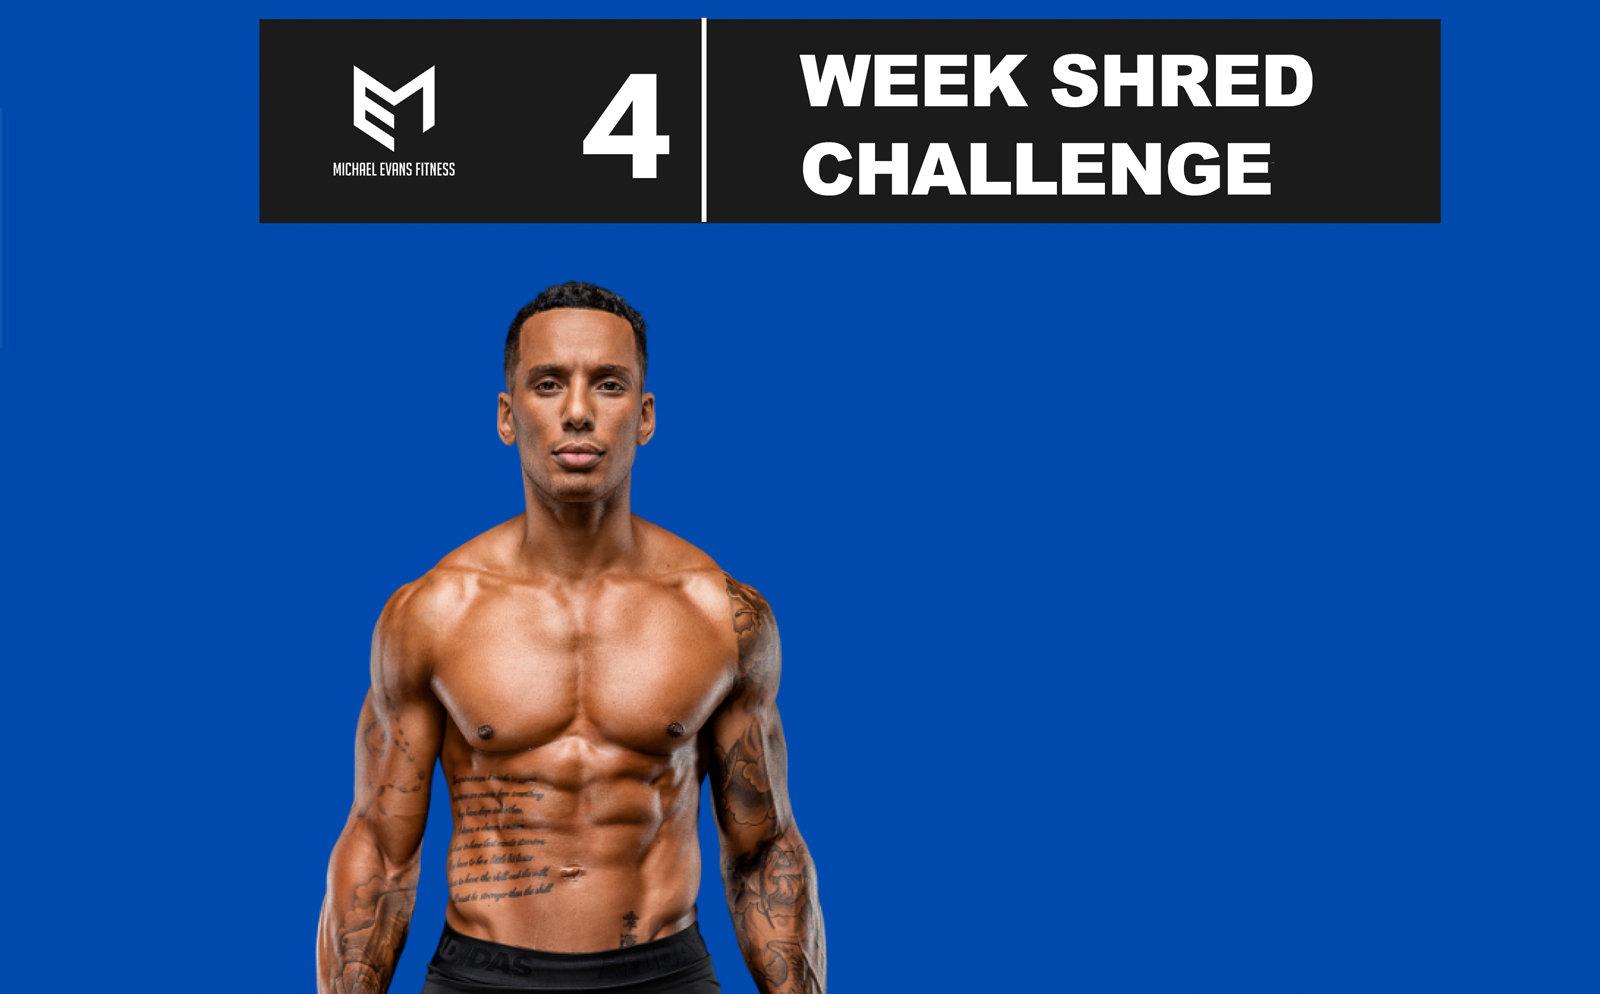 May - 4 Week Shred Challenge